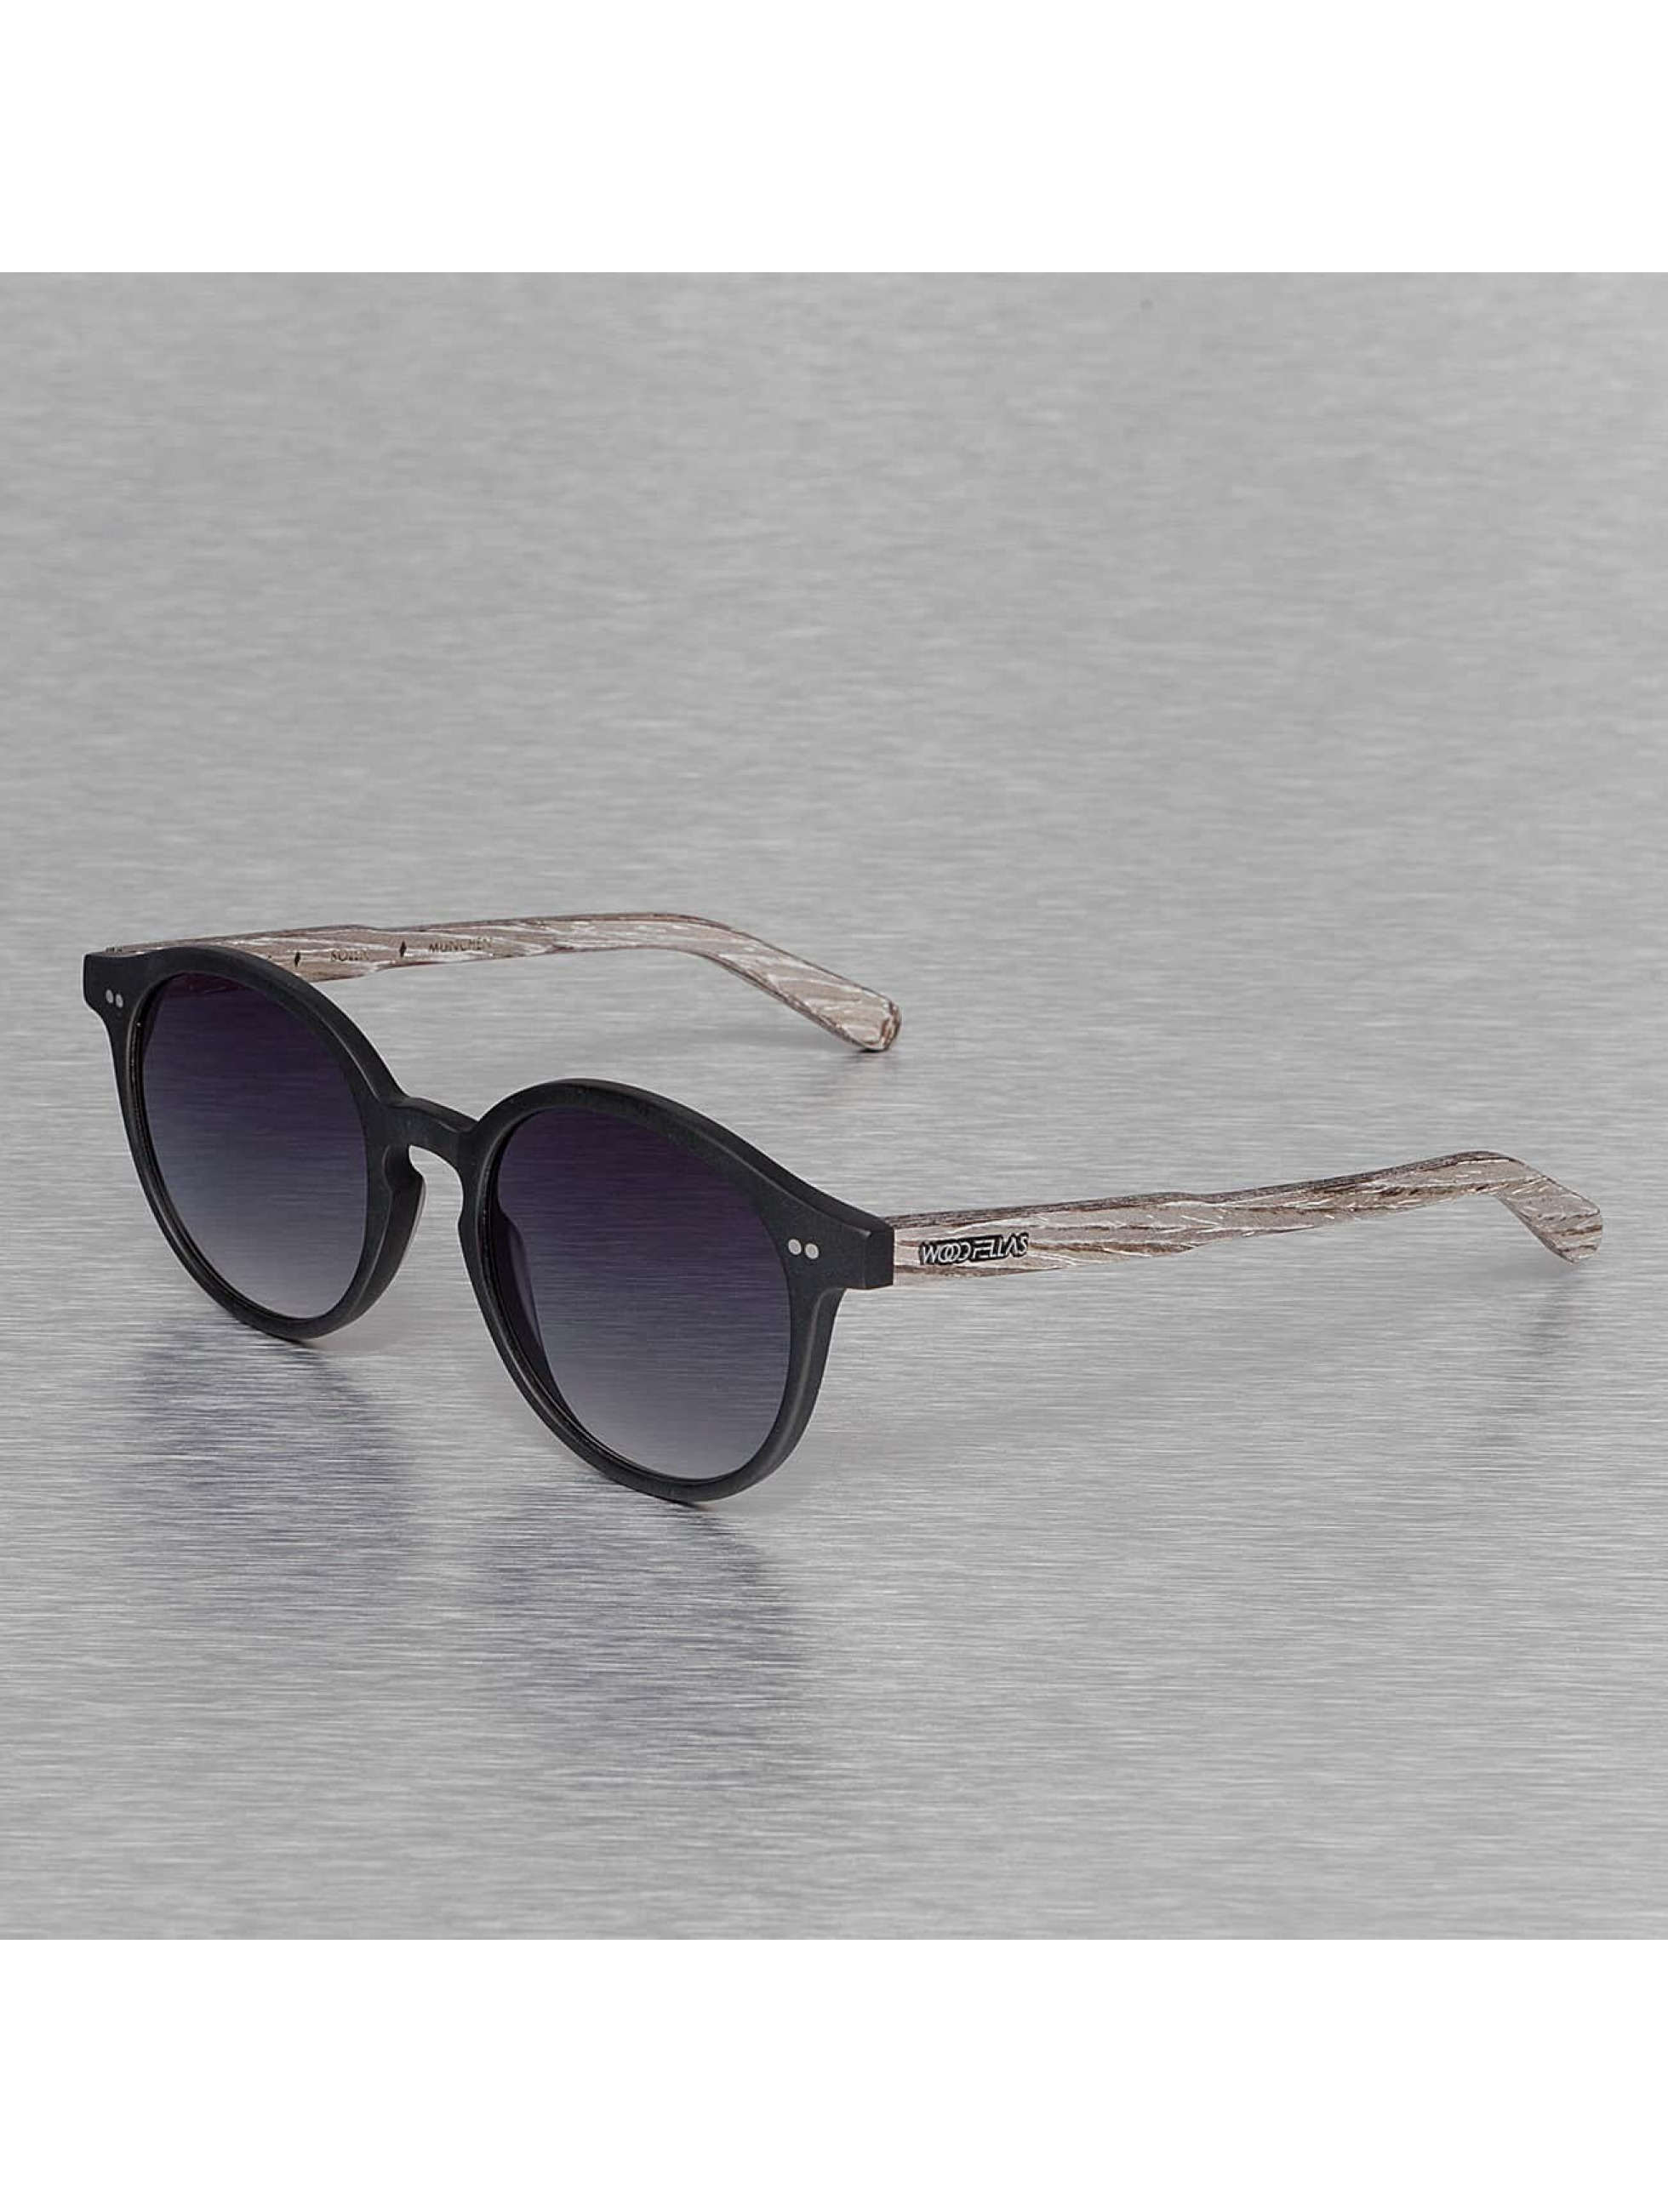 Wood Fellas Eyewear Männer,Frauen Sonnenbrille Eyewear Solln Polarized Mirror in schwarz